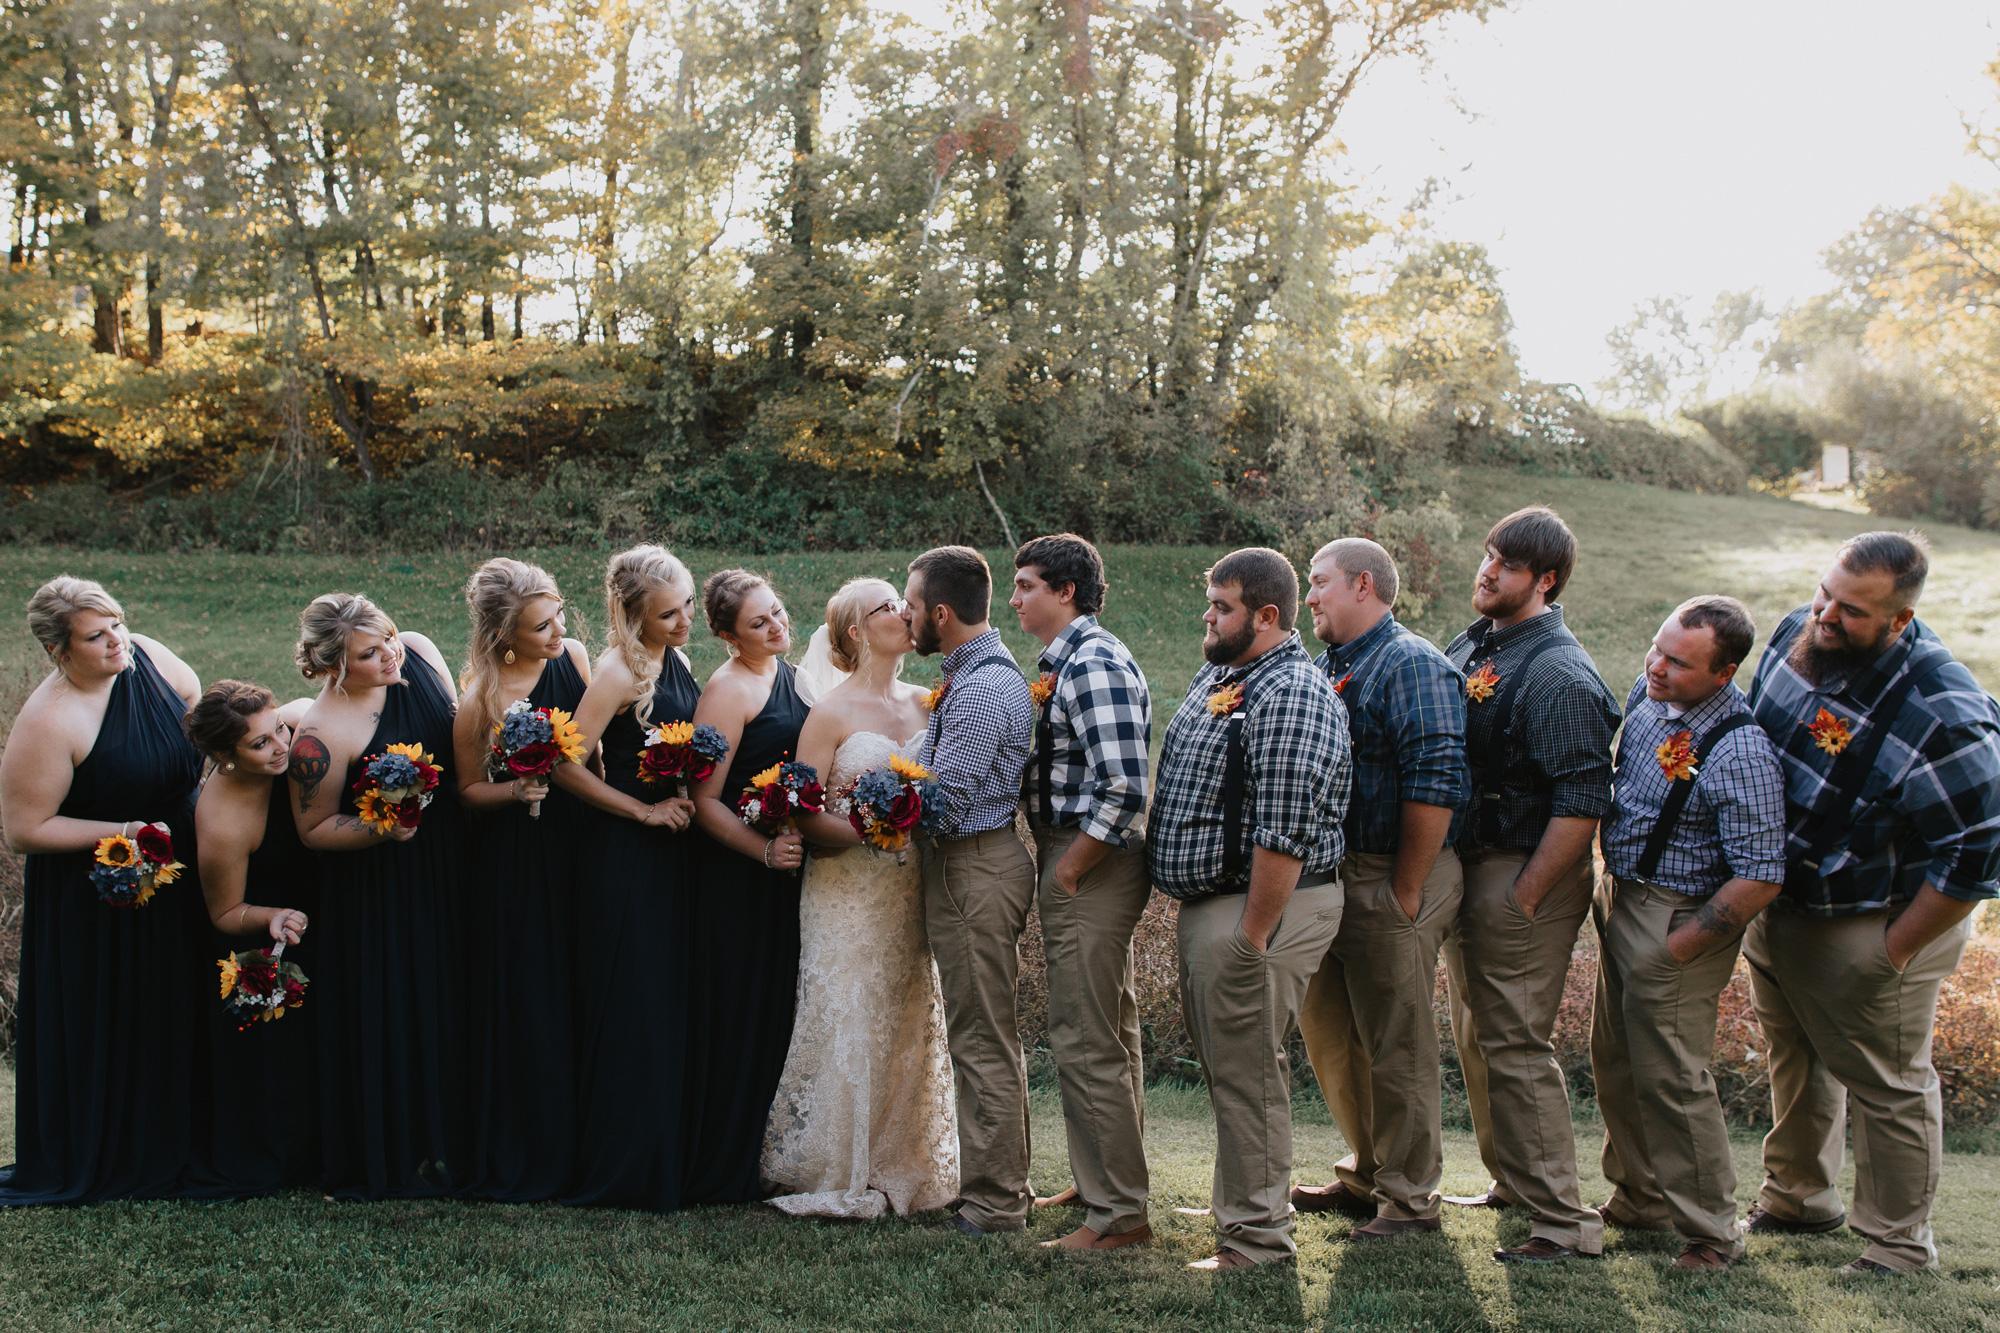 lehigh-valley-wedding-bridal-party-photography